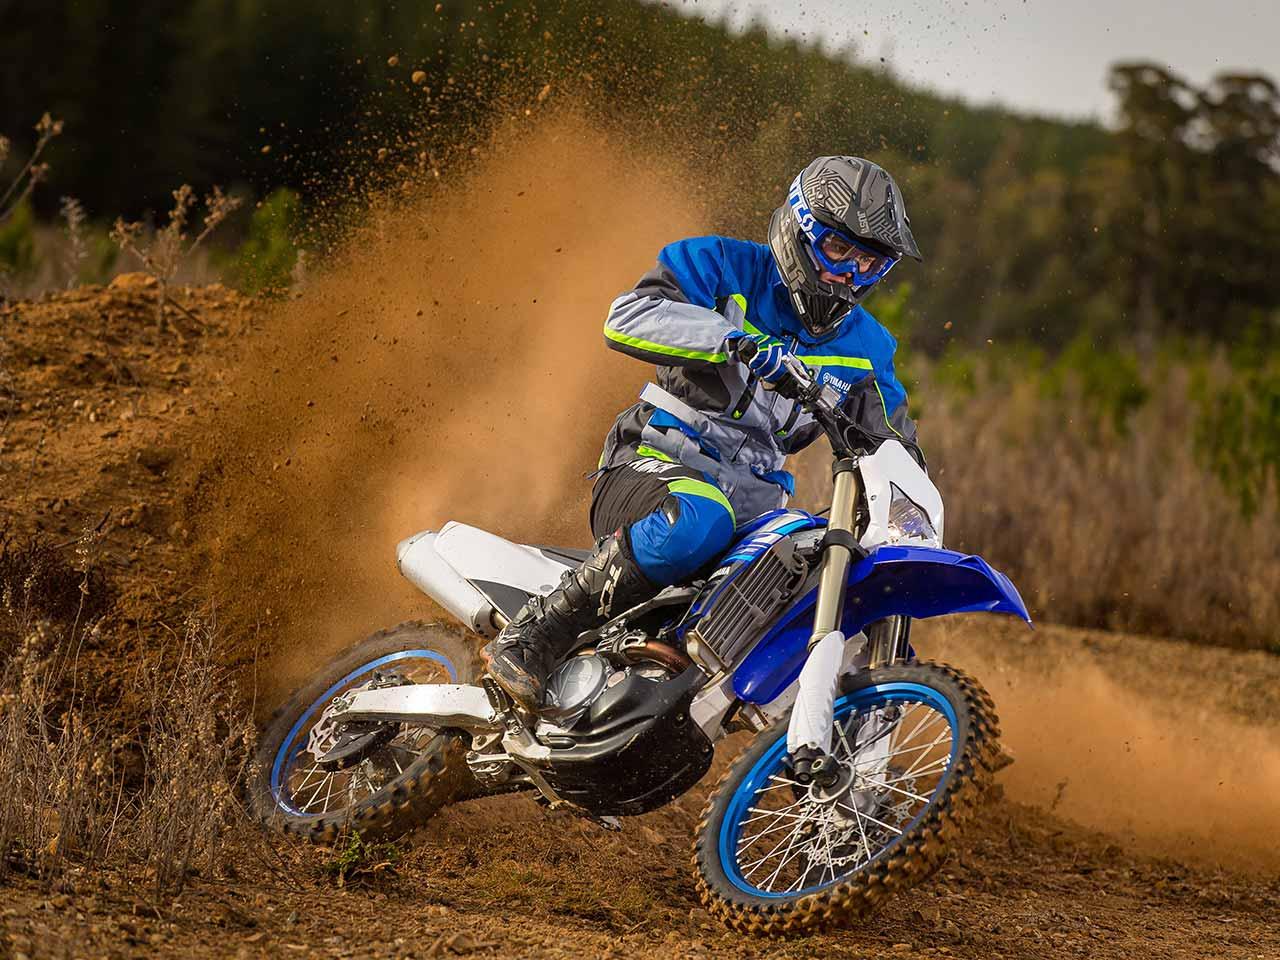 2020 Yamaha WR450F Gallery 4